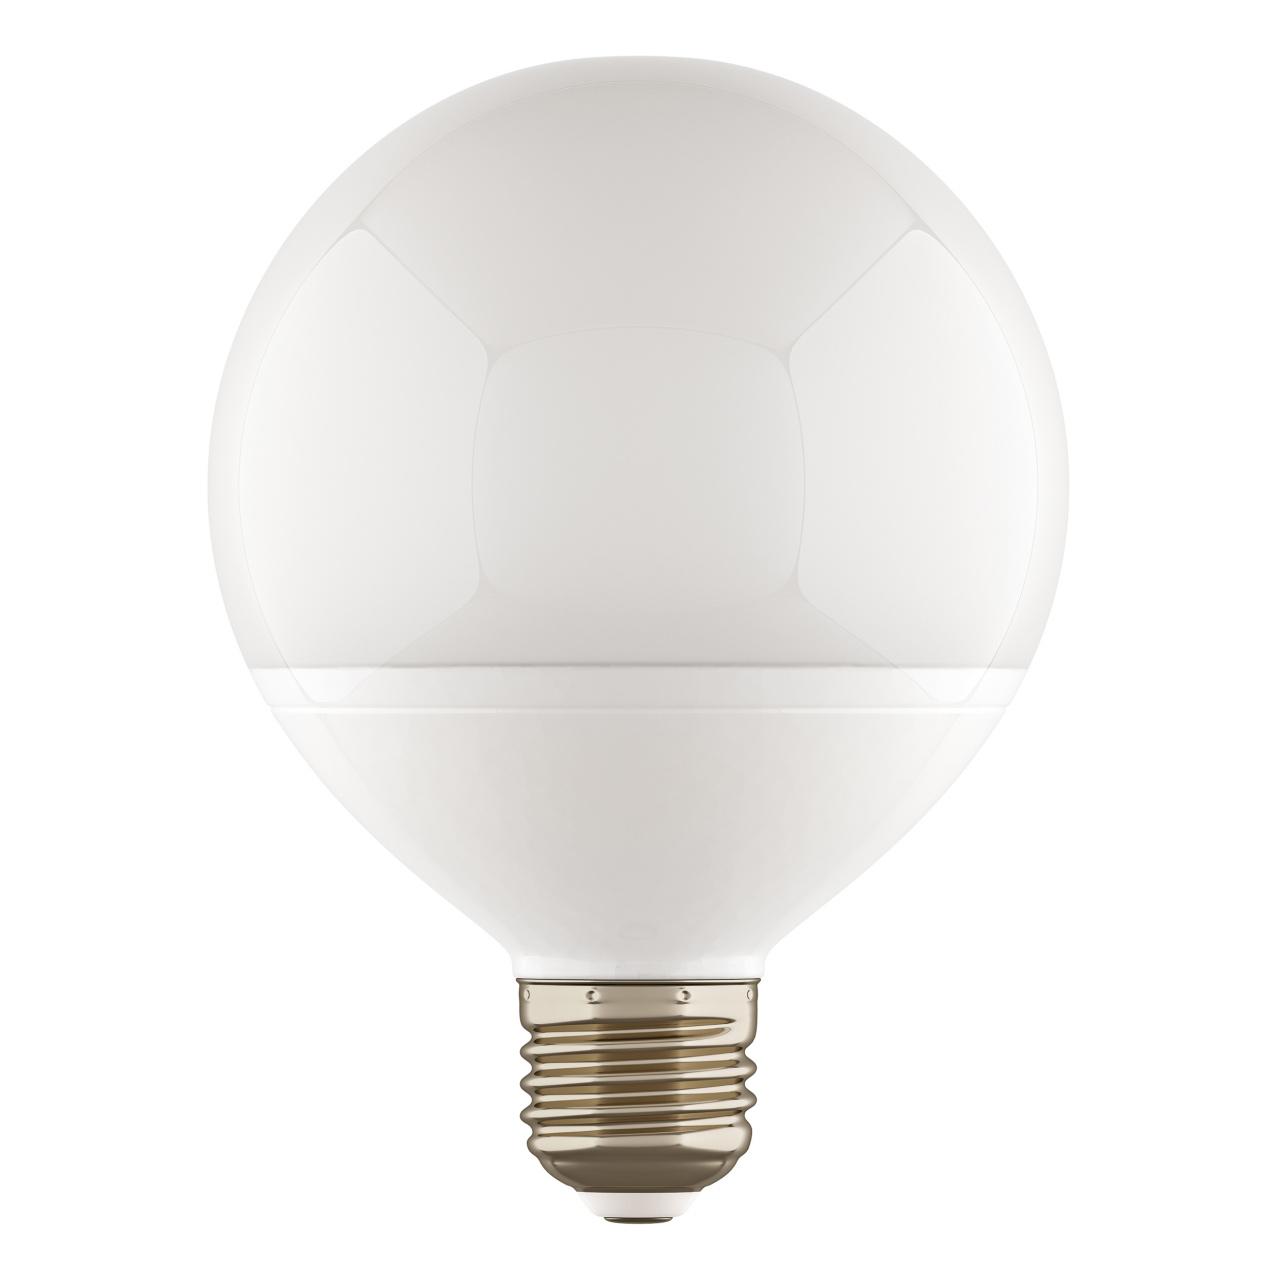 Лампа LED 220V G95 E27 13W=130W 1100LM 180G FR 4000K 20000H Lightstar 930314